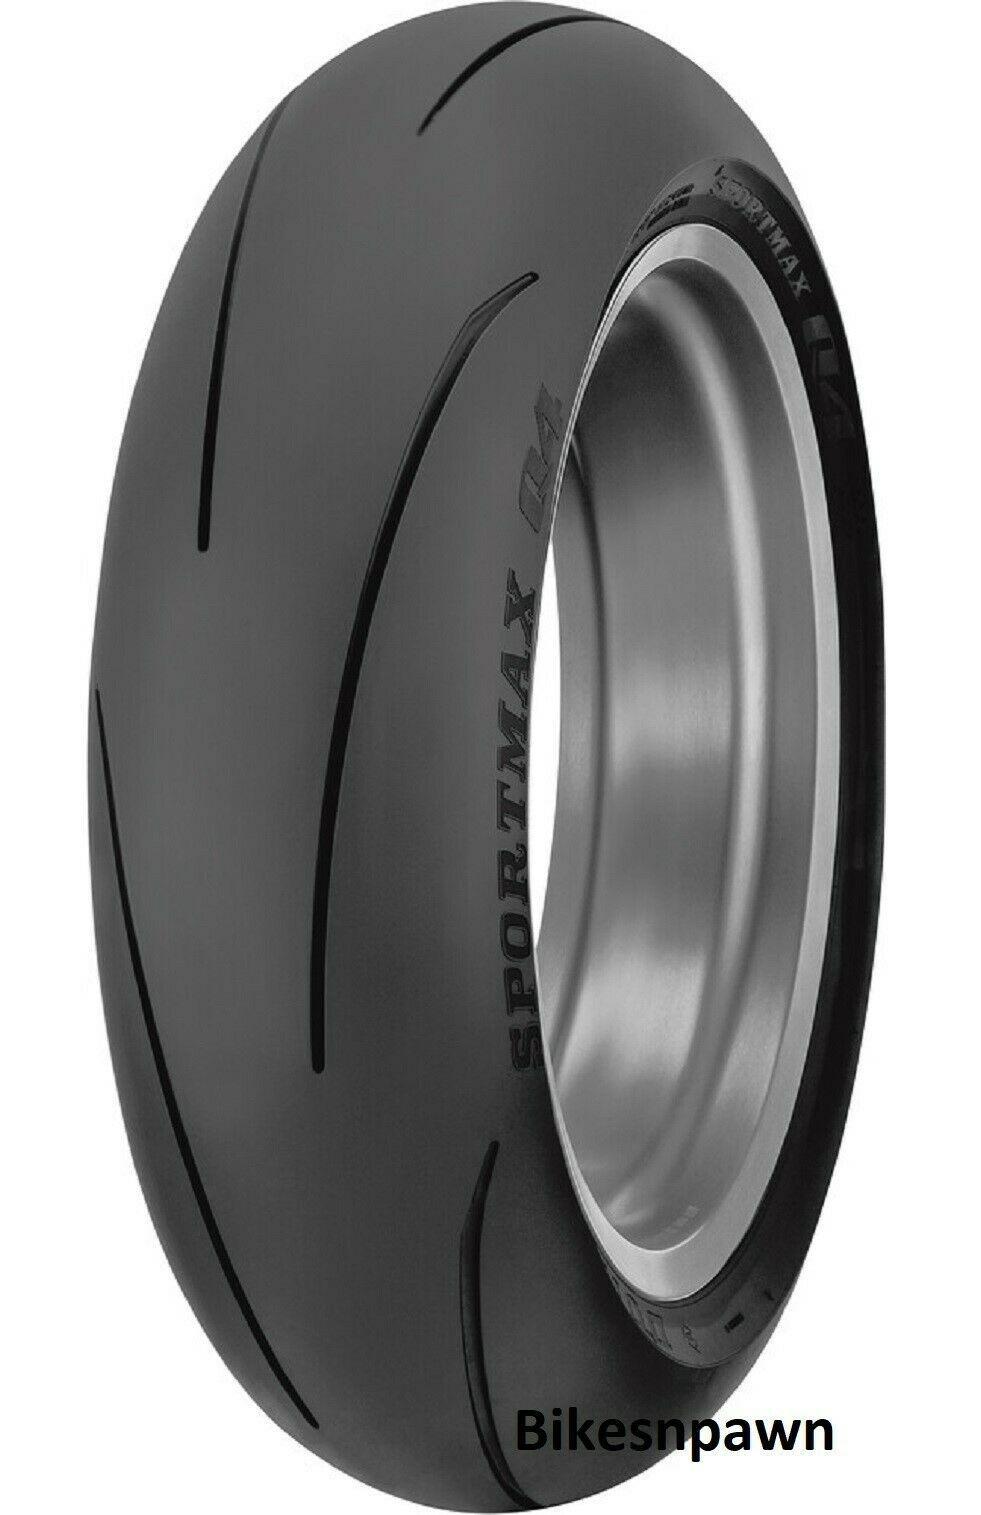 New 190/55ZR17 Dunlop Q4 Sportmax Rear Radial Motorcycle Tire 75W TL